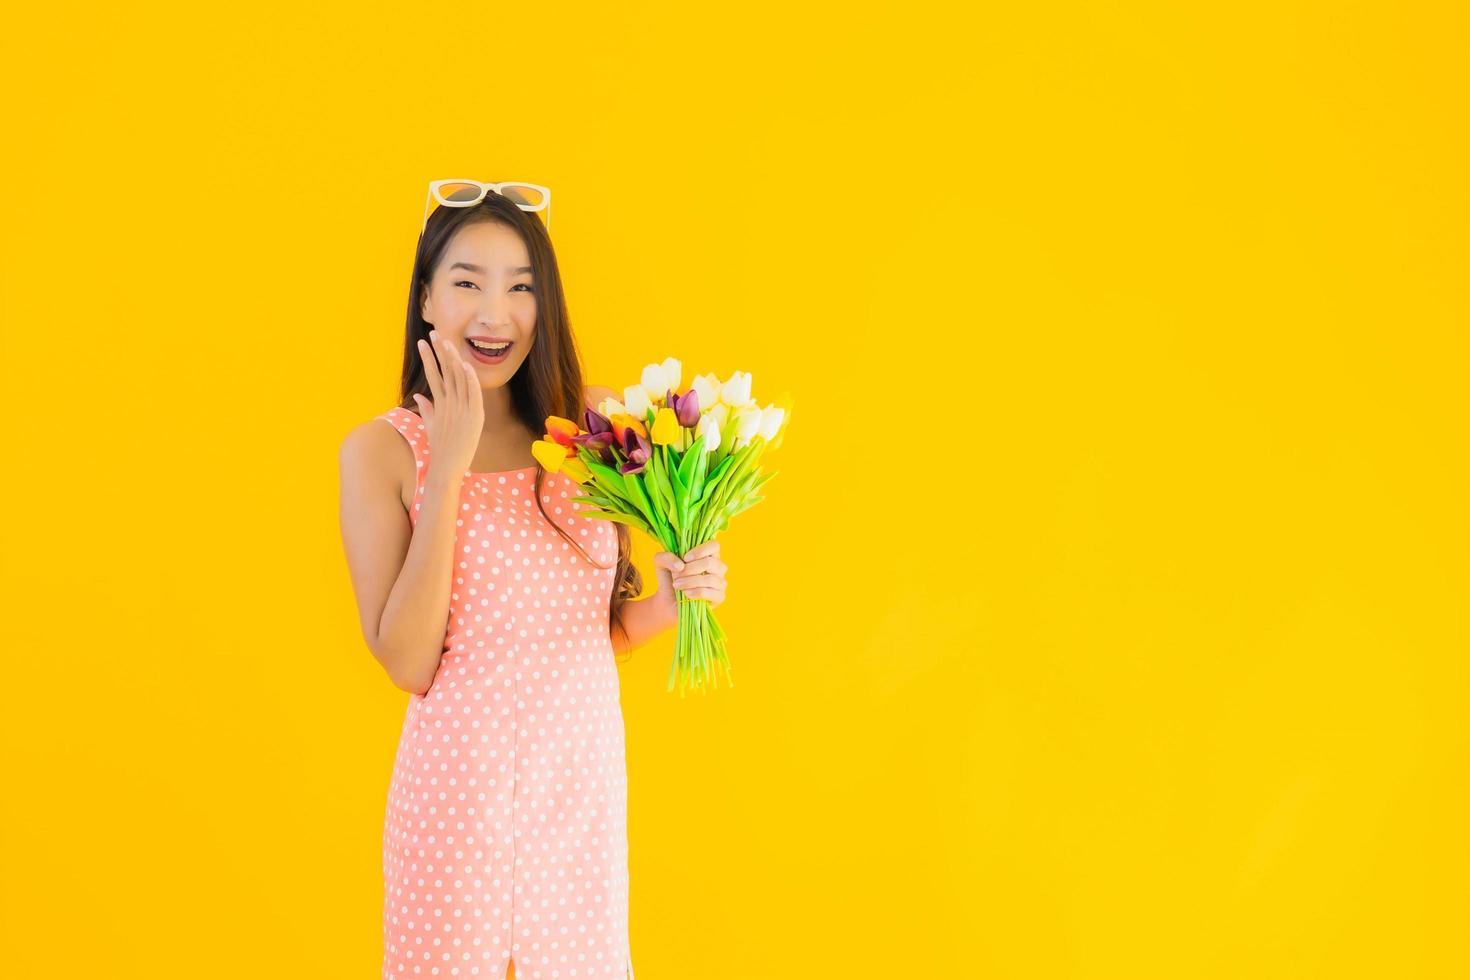 kvinna med bukett blommor foto